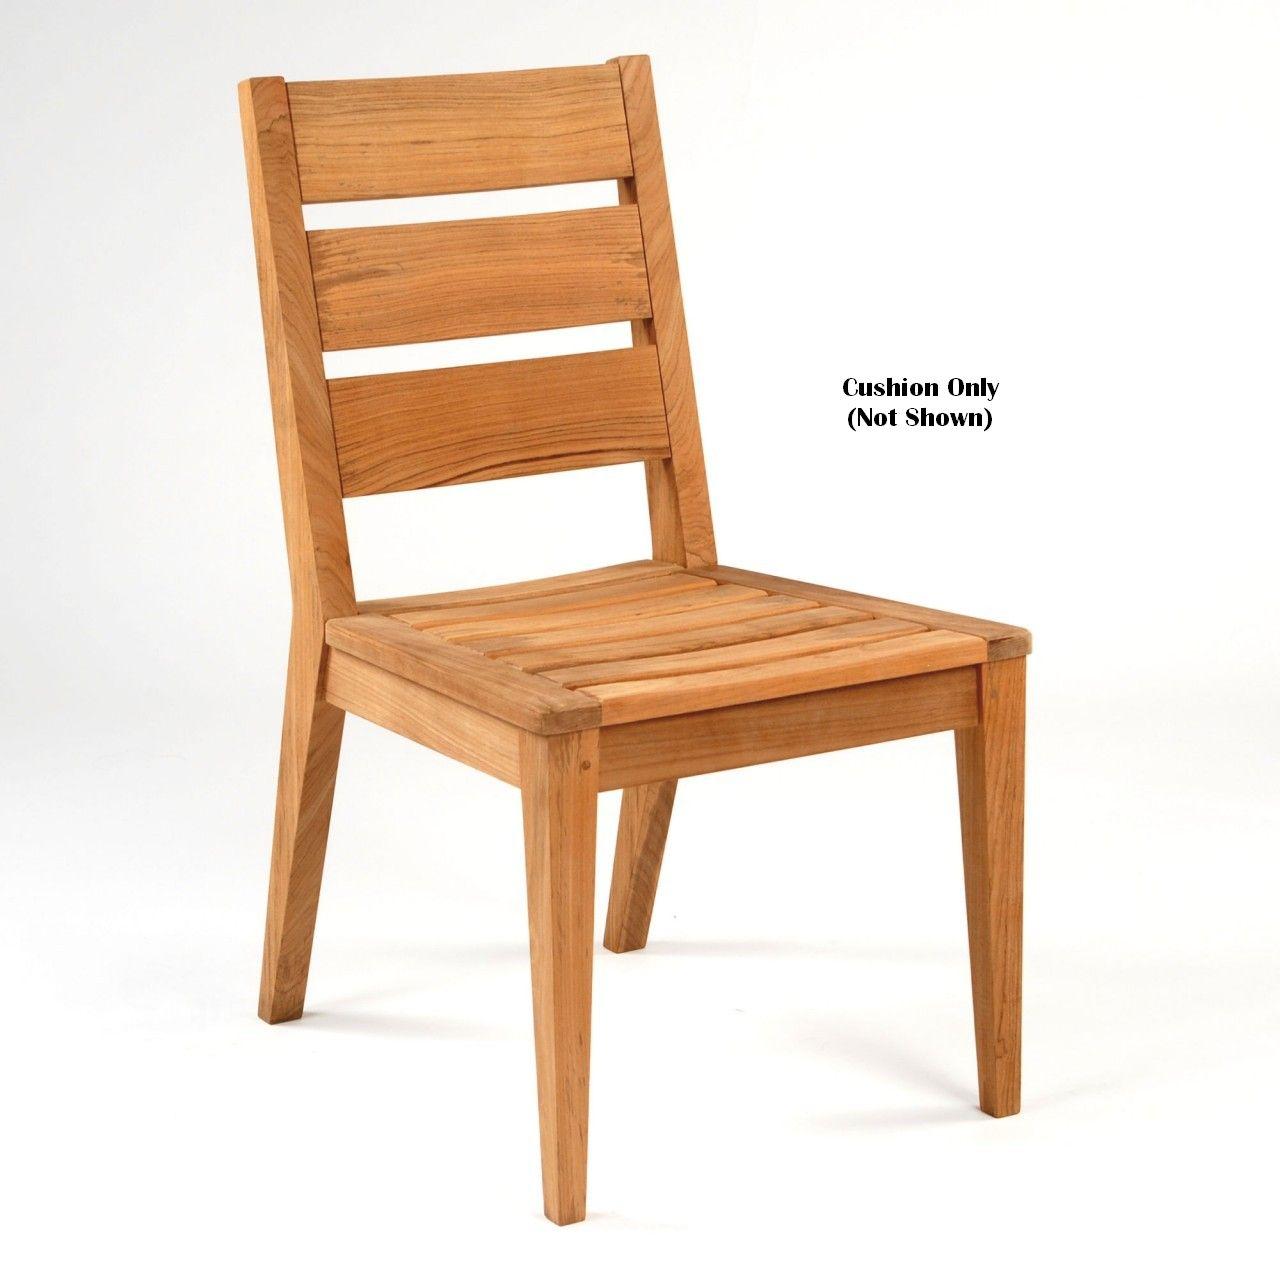 Kingsley-Bate Algarve Dining Side Chair Cushion